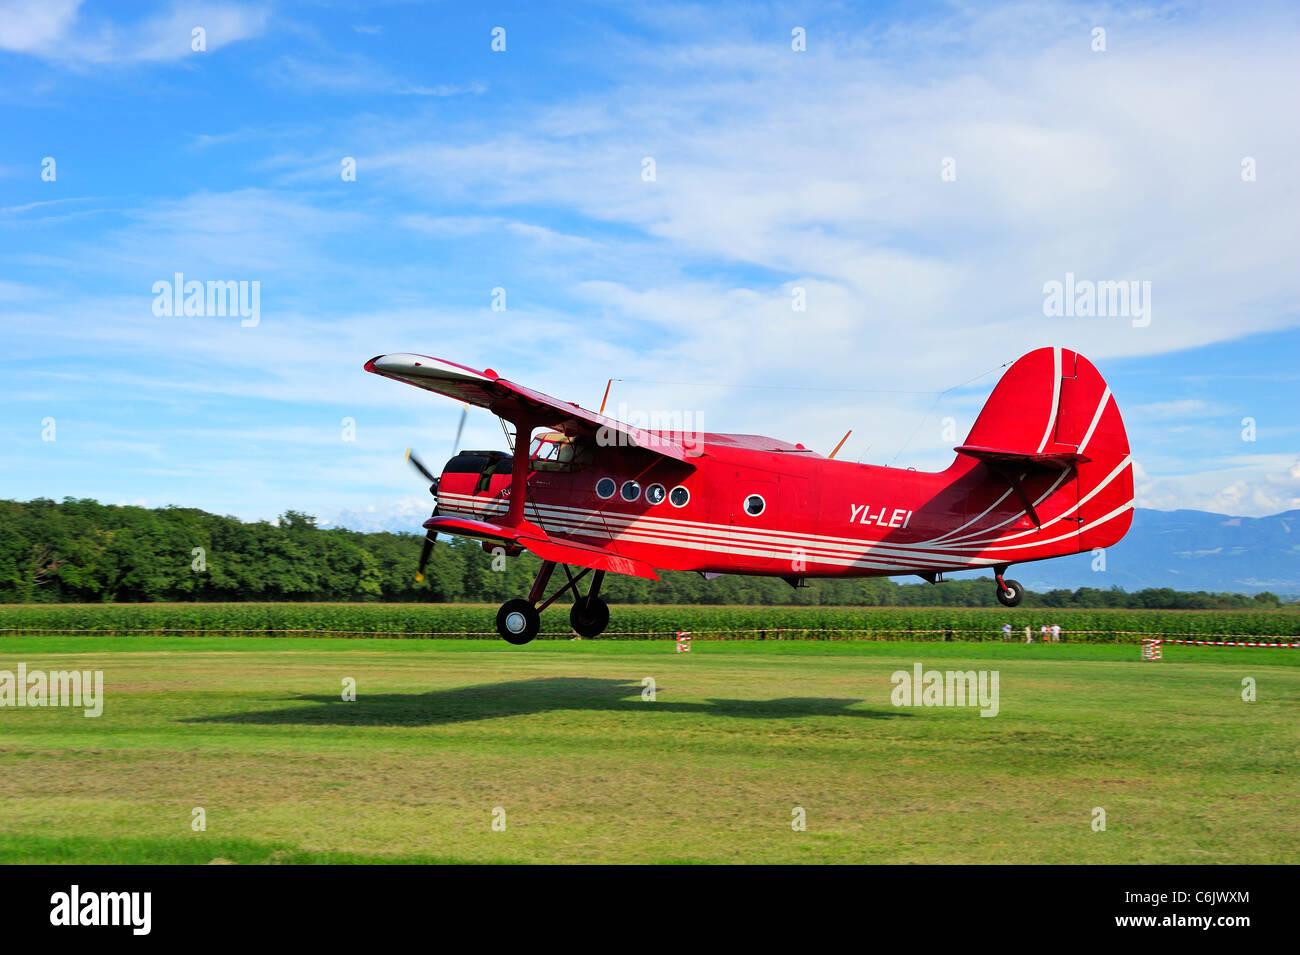 An Antonov AN-2 biplane landing. Motion blur on the background. - Stock Image